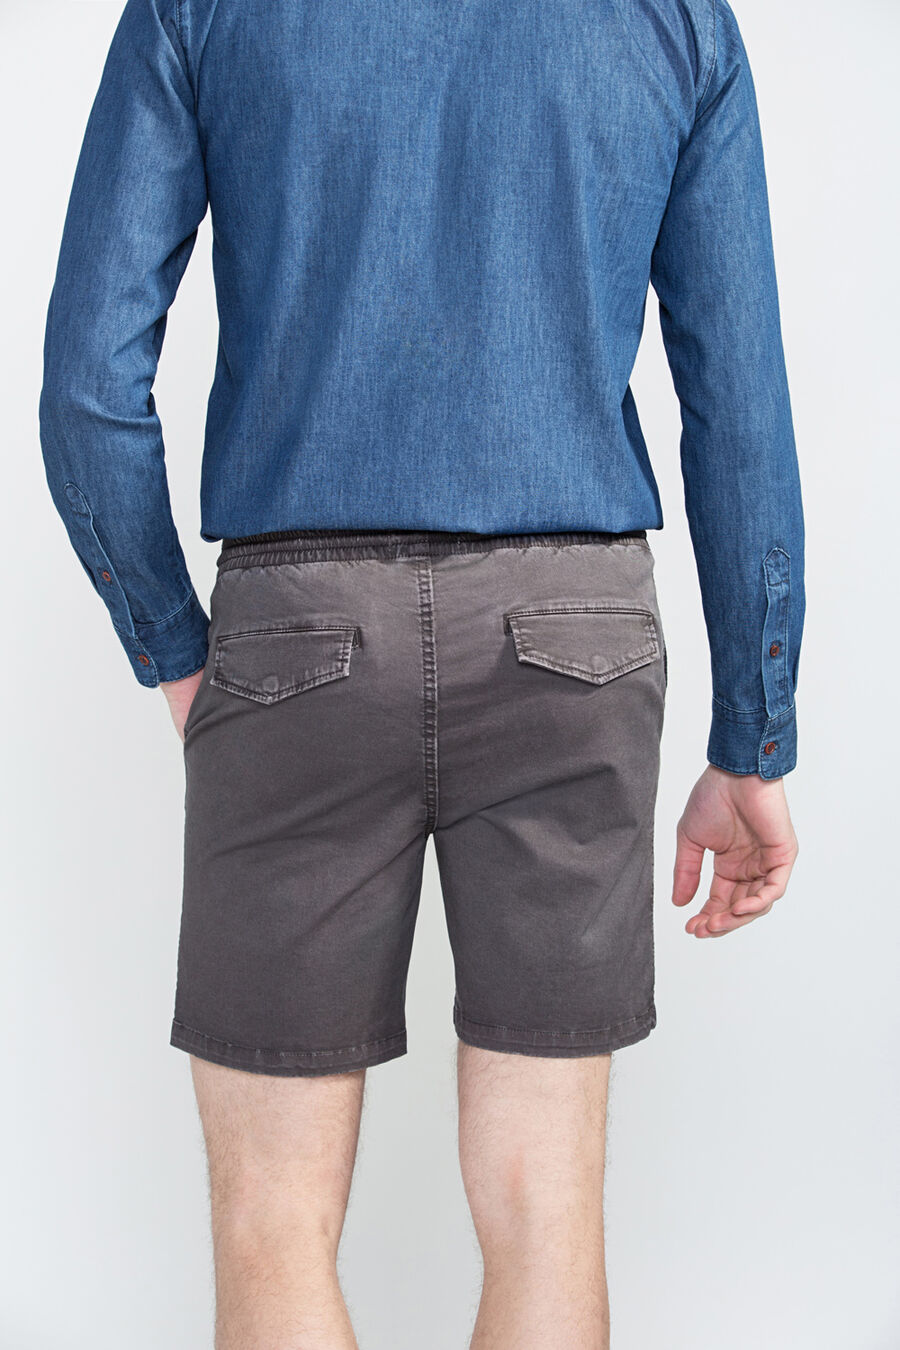 Slim fit bermuda shorts